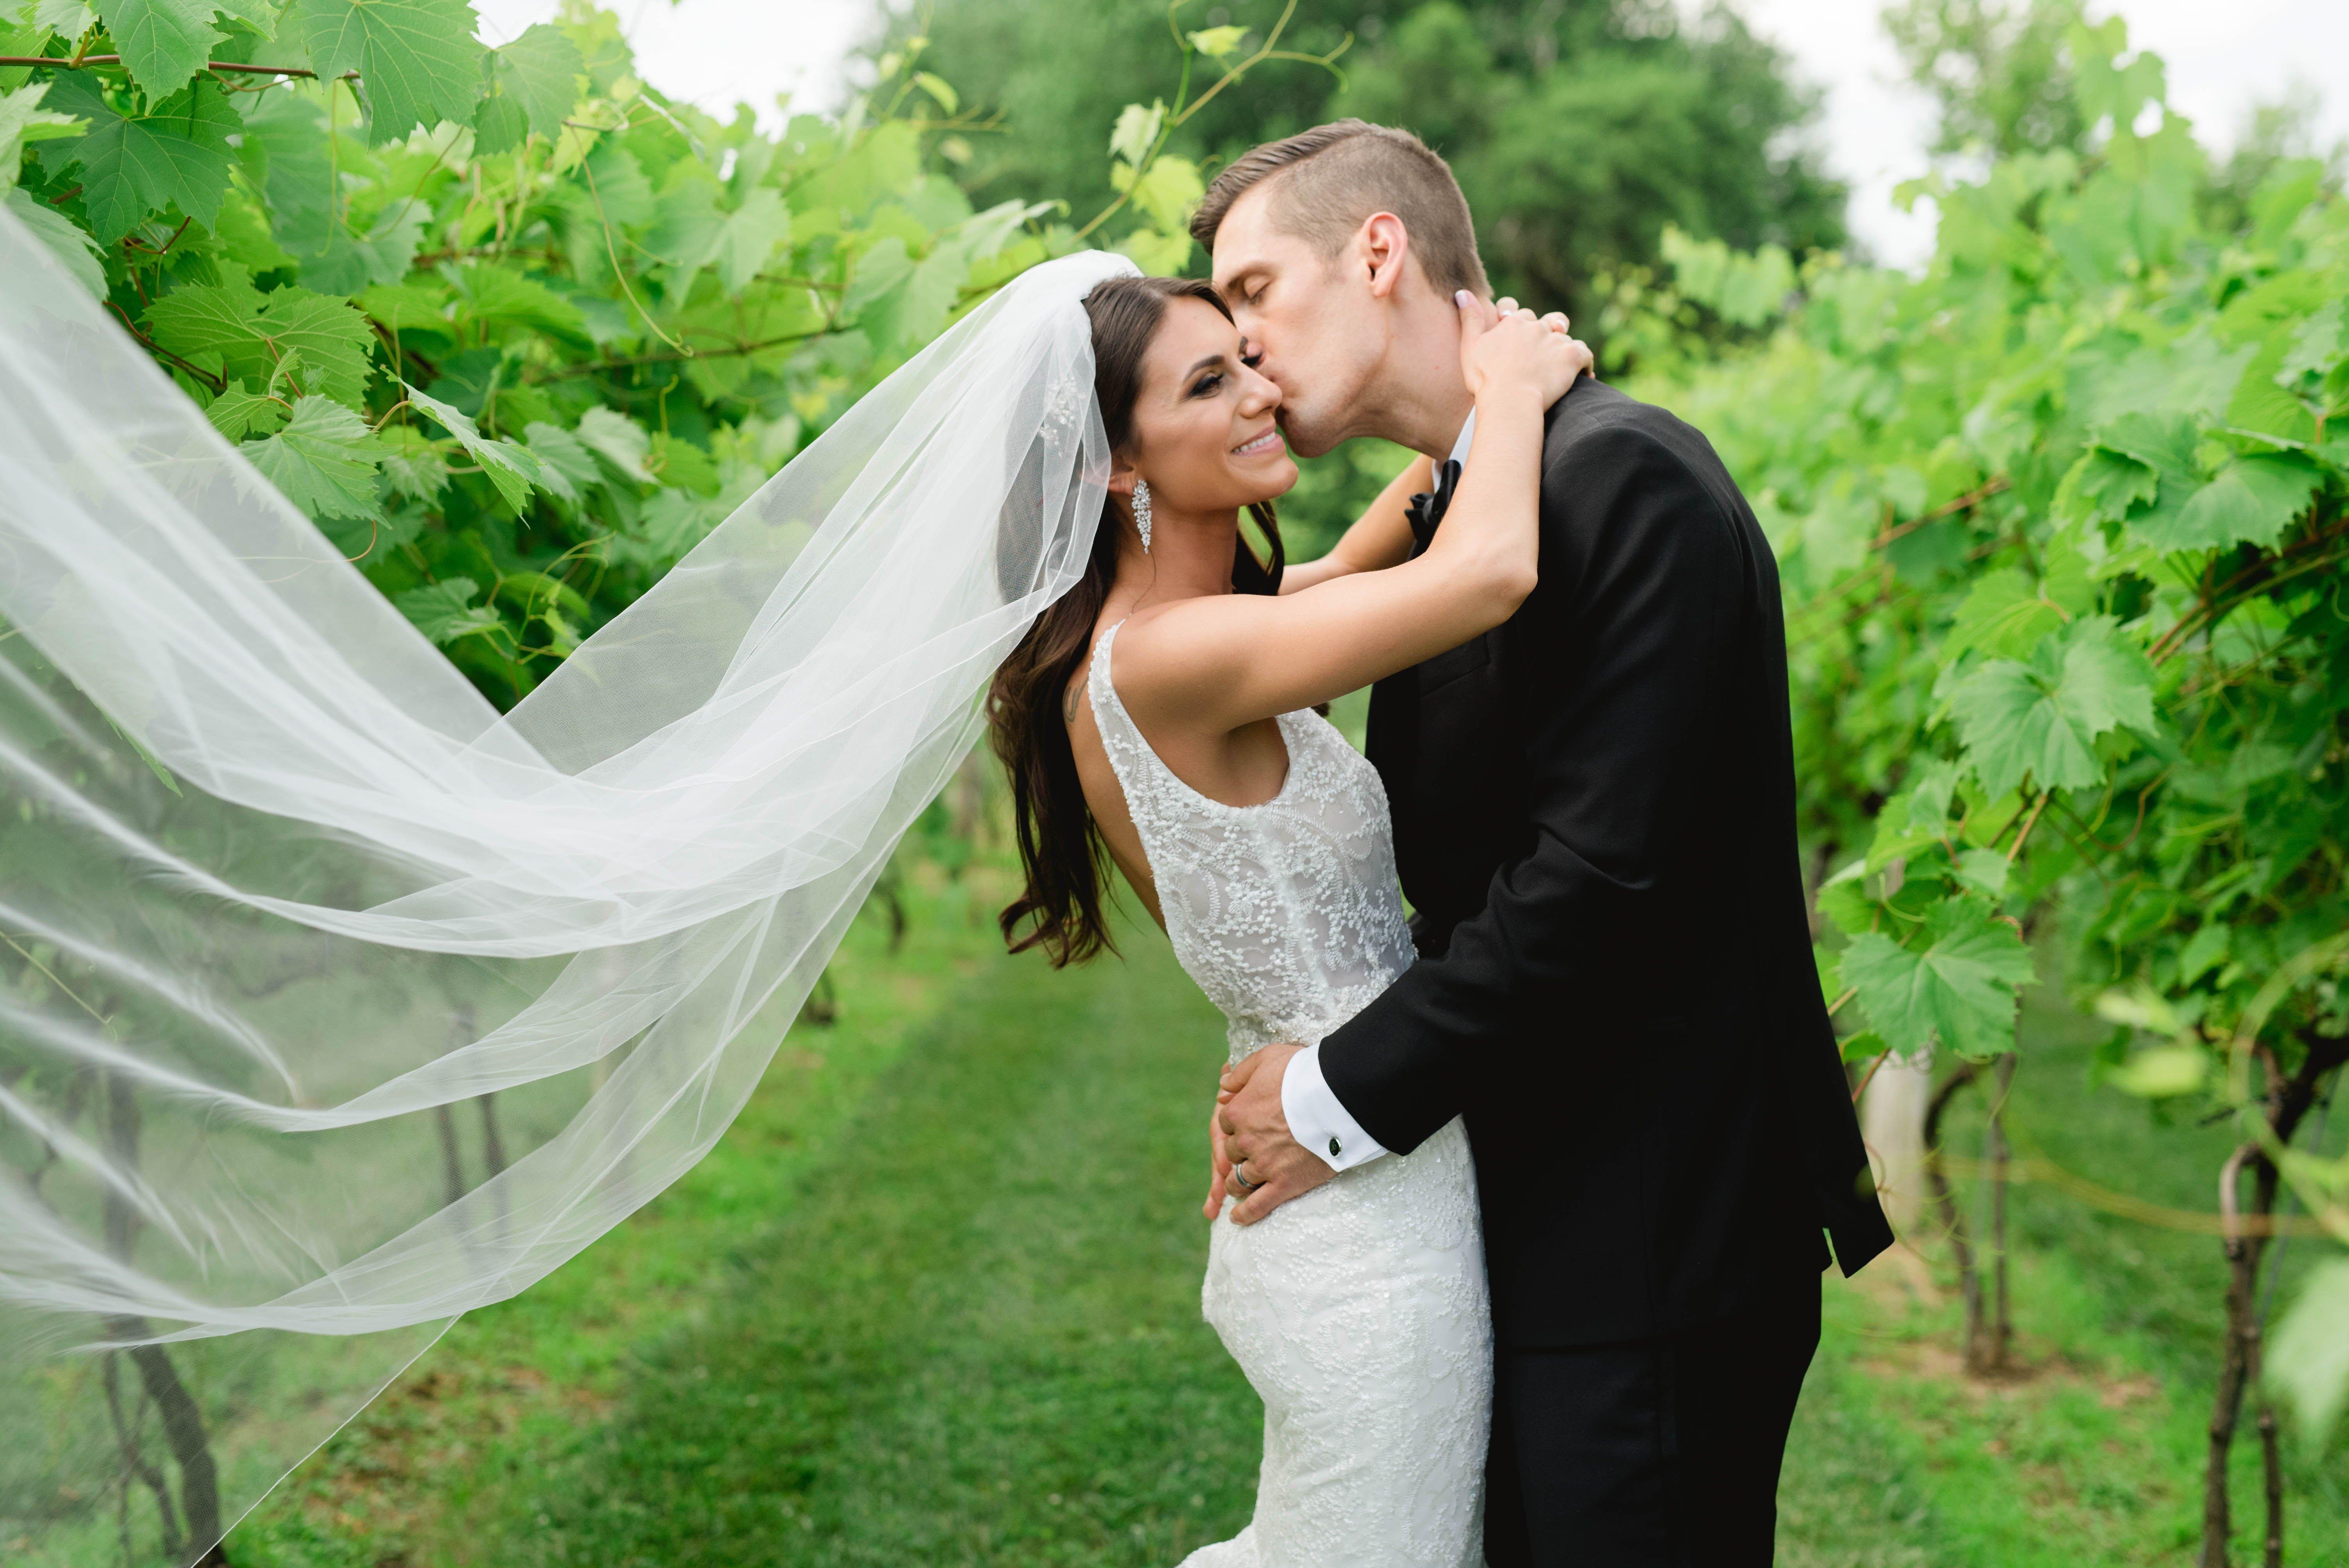 Elegant Summer Wedding At Gervasi Vineyard Canton Oh Niki Marie Photography In 2020 Wedding Inspiration Summer Enzoani Wedding Dresses Vineyard Wedding